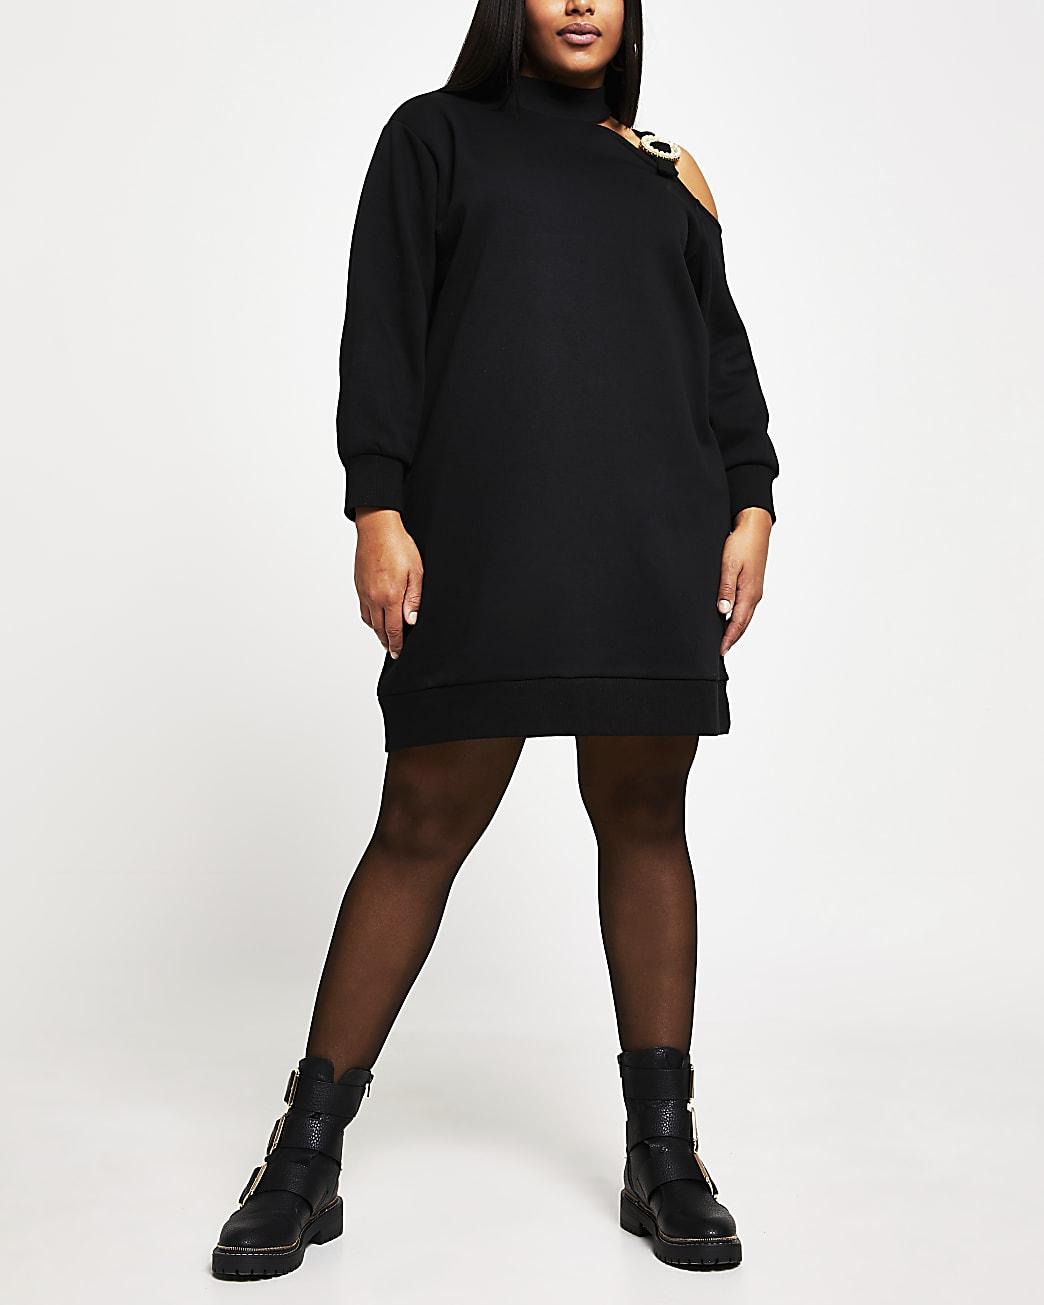 Plus black cut out buckle sweater dress